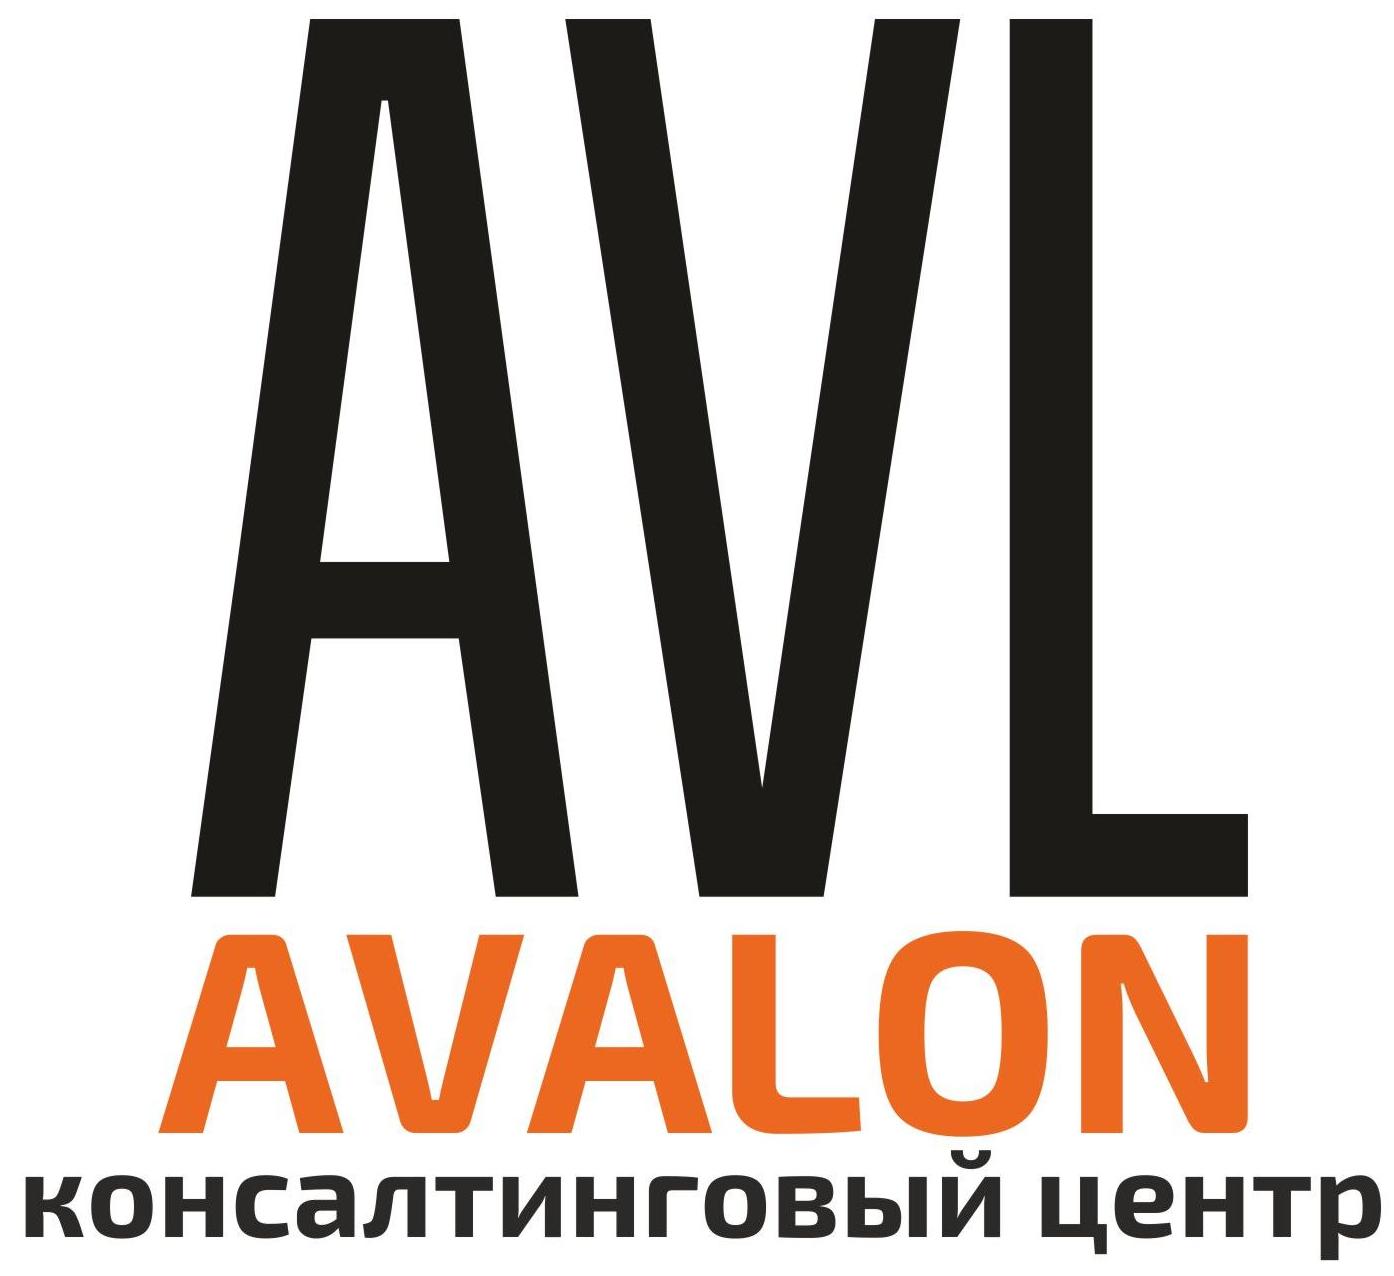 AVALON Консалтинговый центр